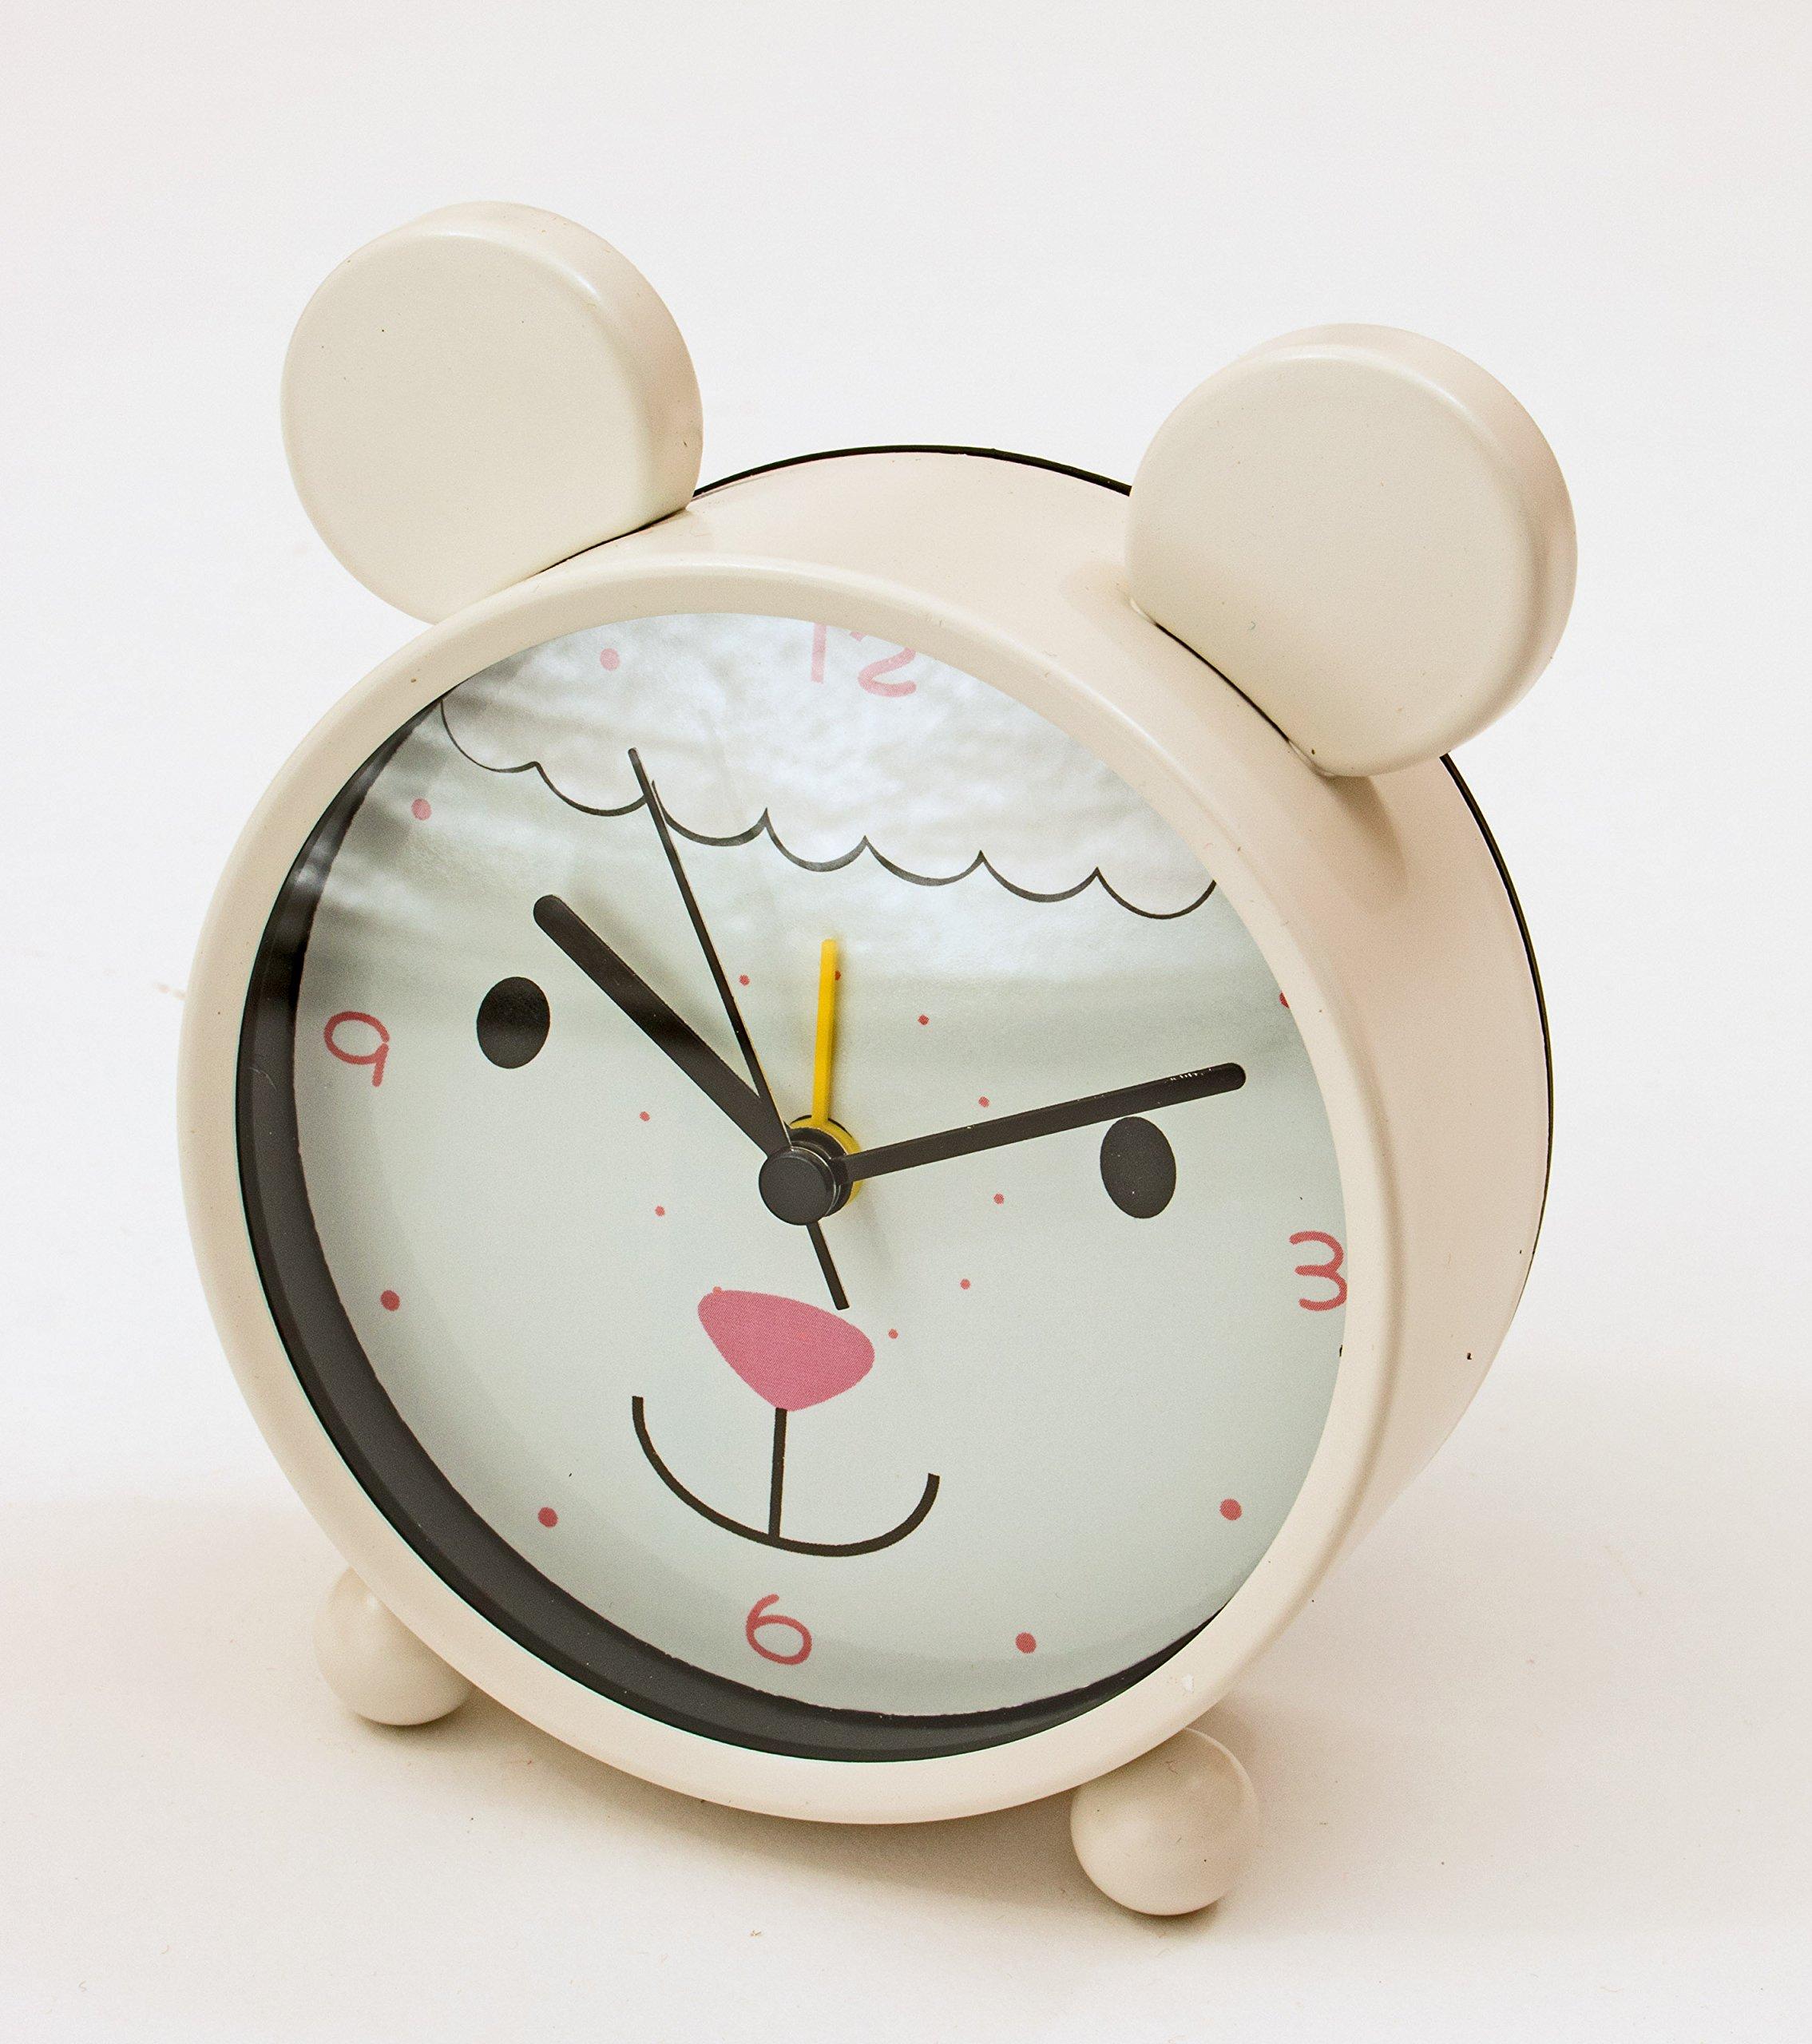 MW Lamb Small Animal Table Clock 4X1.5X5